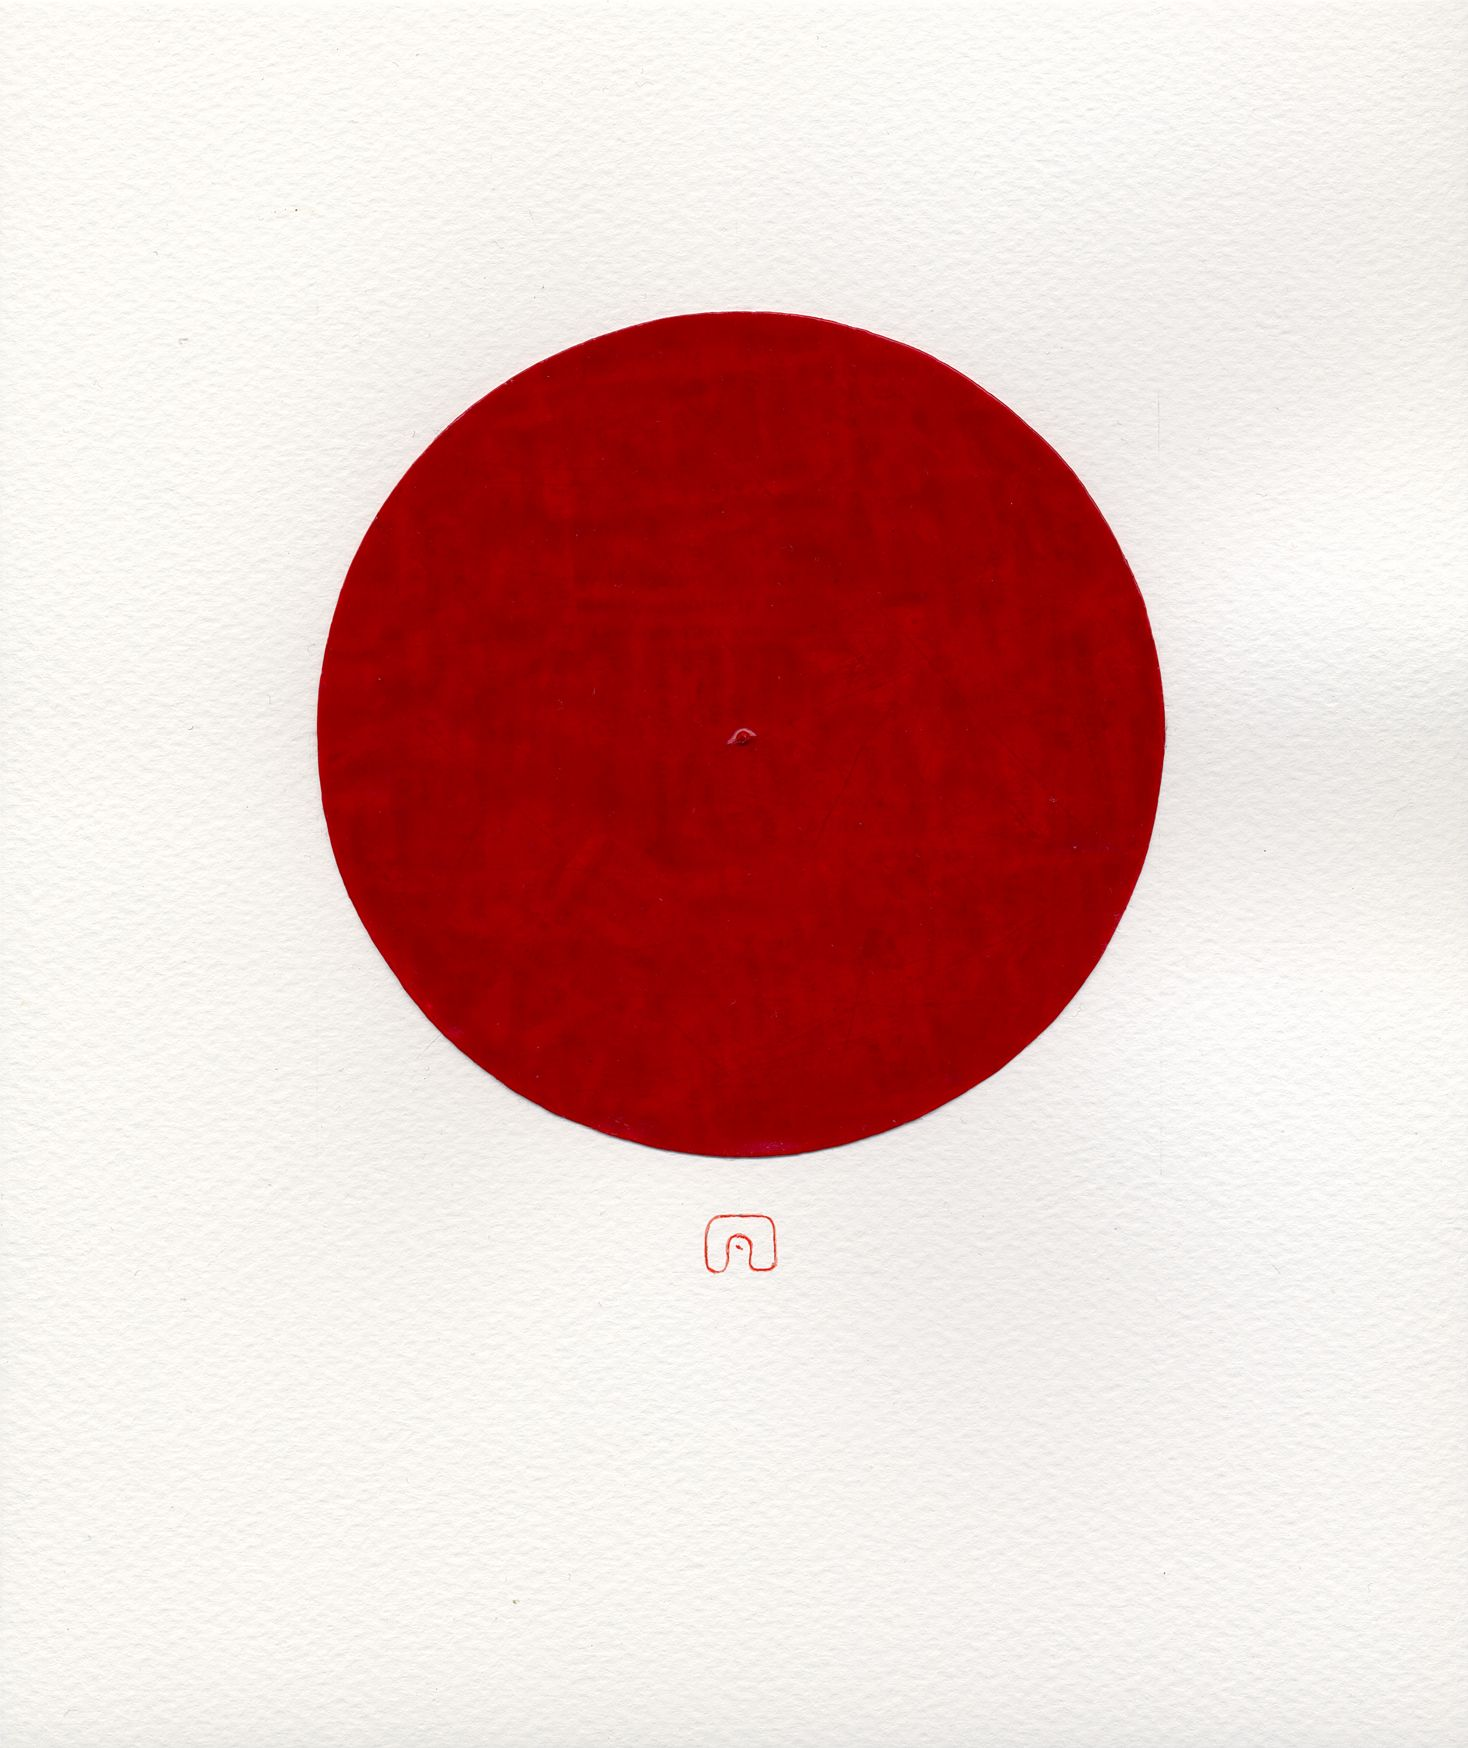 Red Circle D120 N 07 21 X 25 Cm Art By Slavomir Zombek Tantra Art Zen Art Art Inspiration